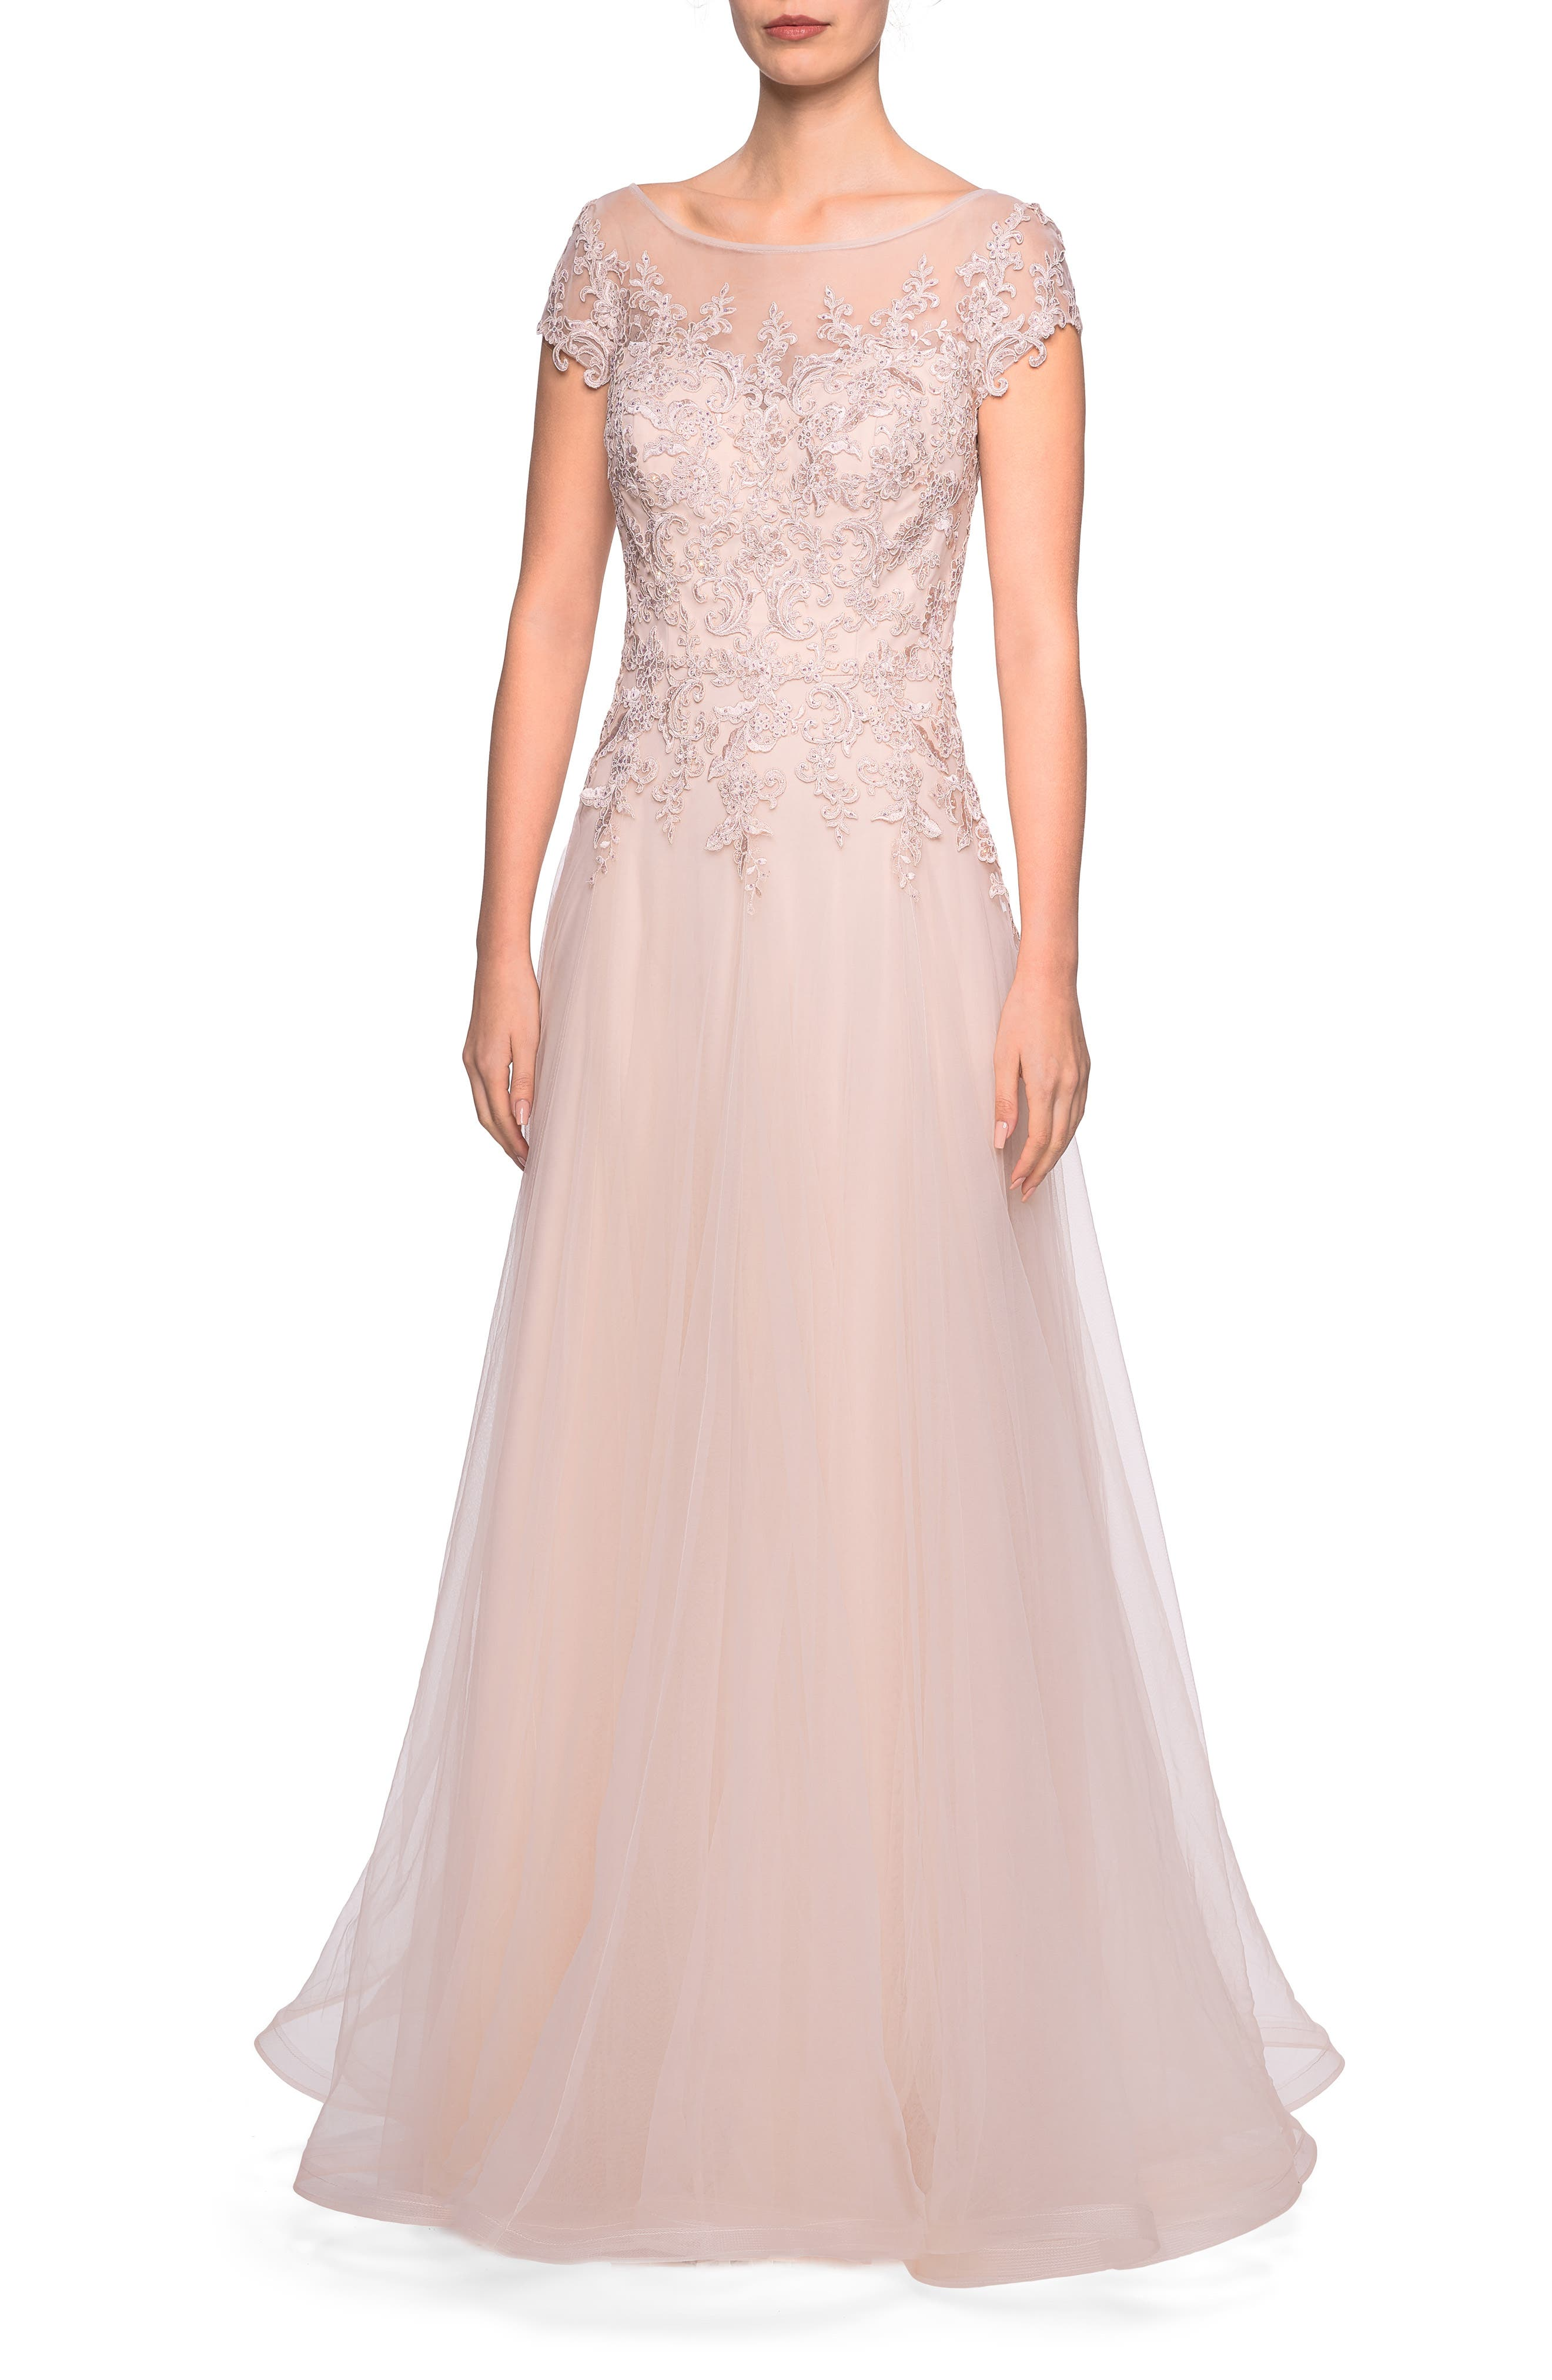 La Femme Tulle A-Line Evening Dress, Pink